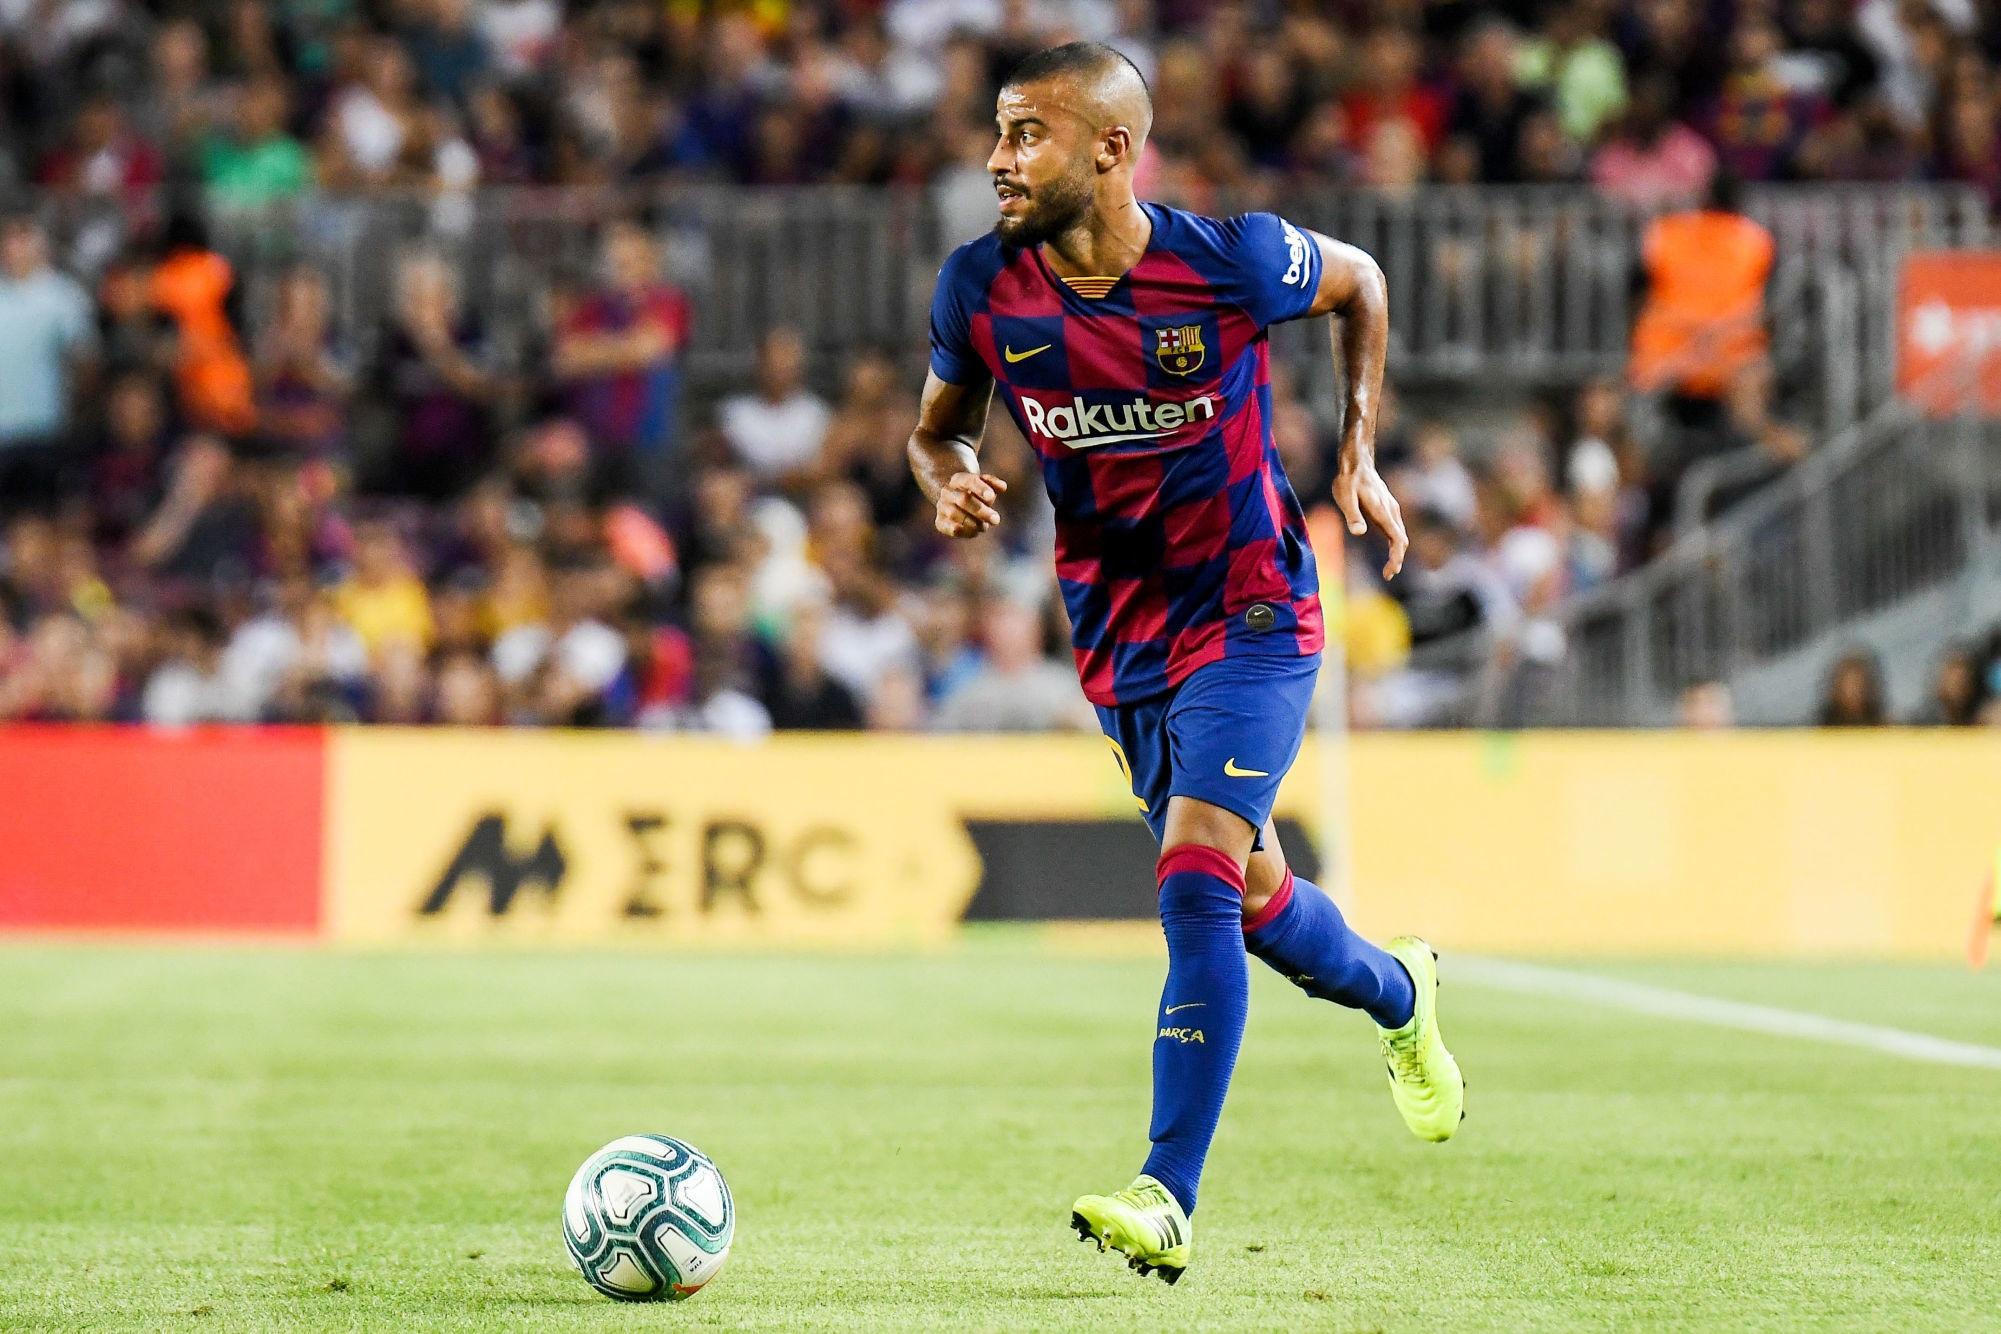 Mercato - Le PSG négocie avec le Barça pour Rafinha, assure Mundo Deportivo